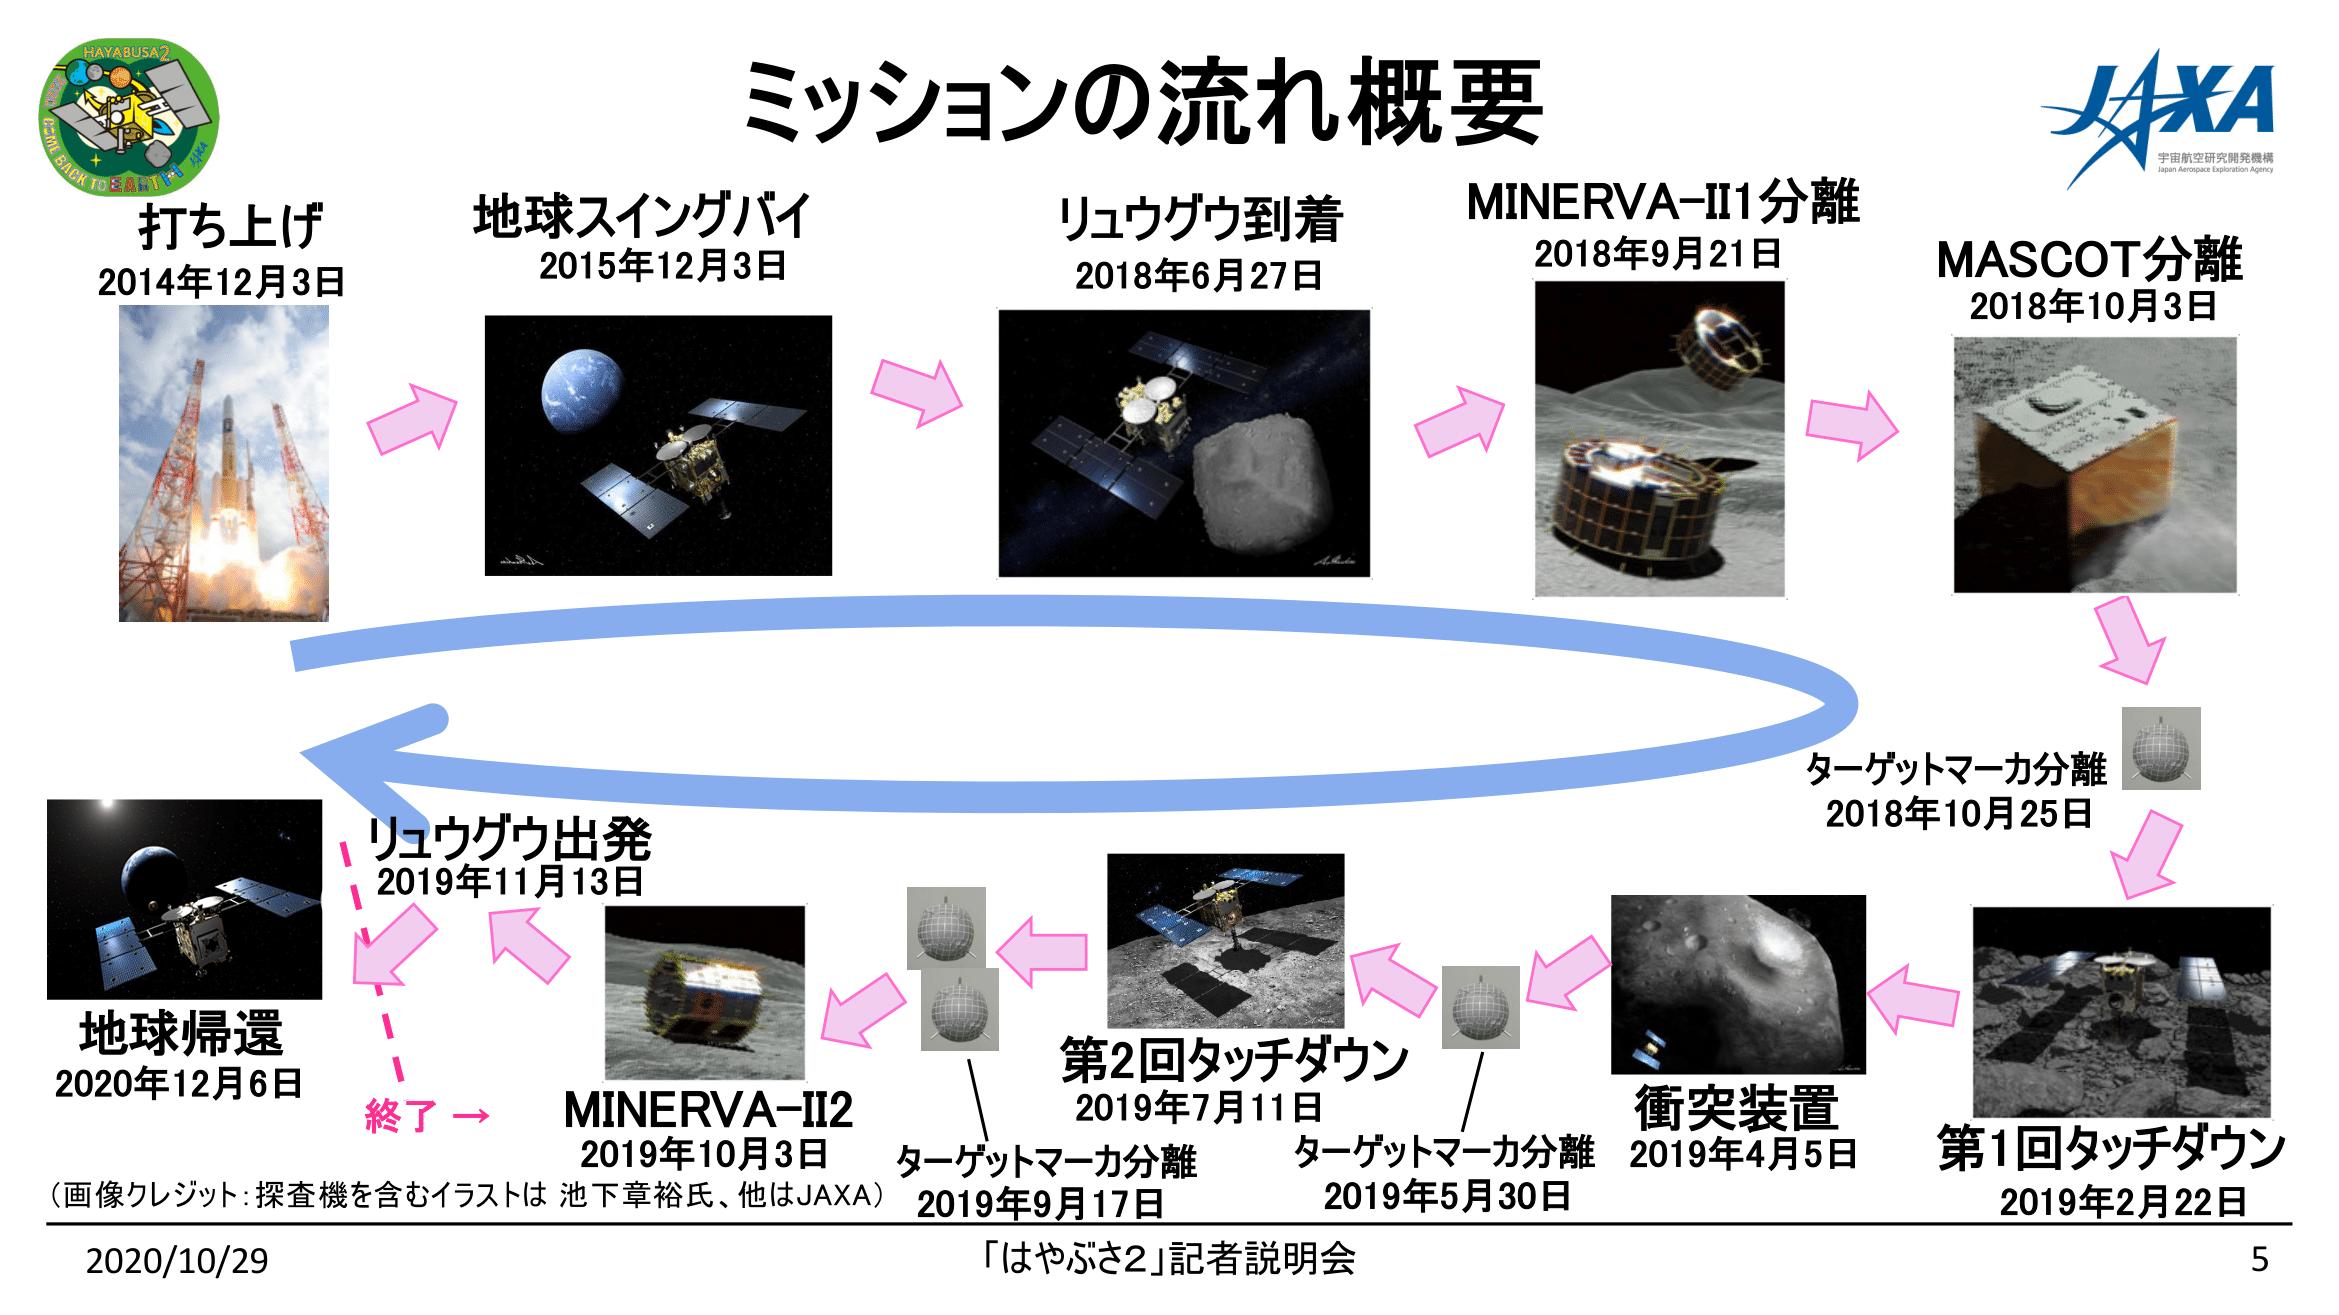 f:id:Imamura:20201029161230p:plain